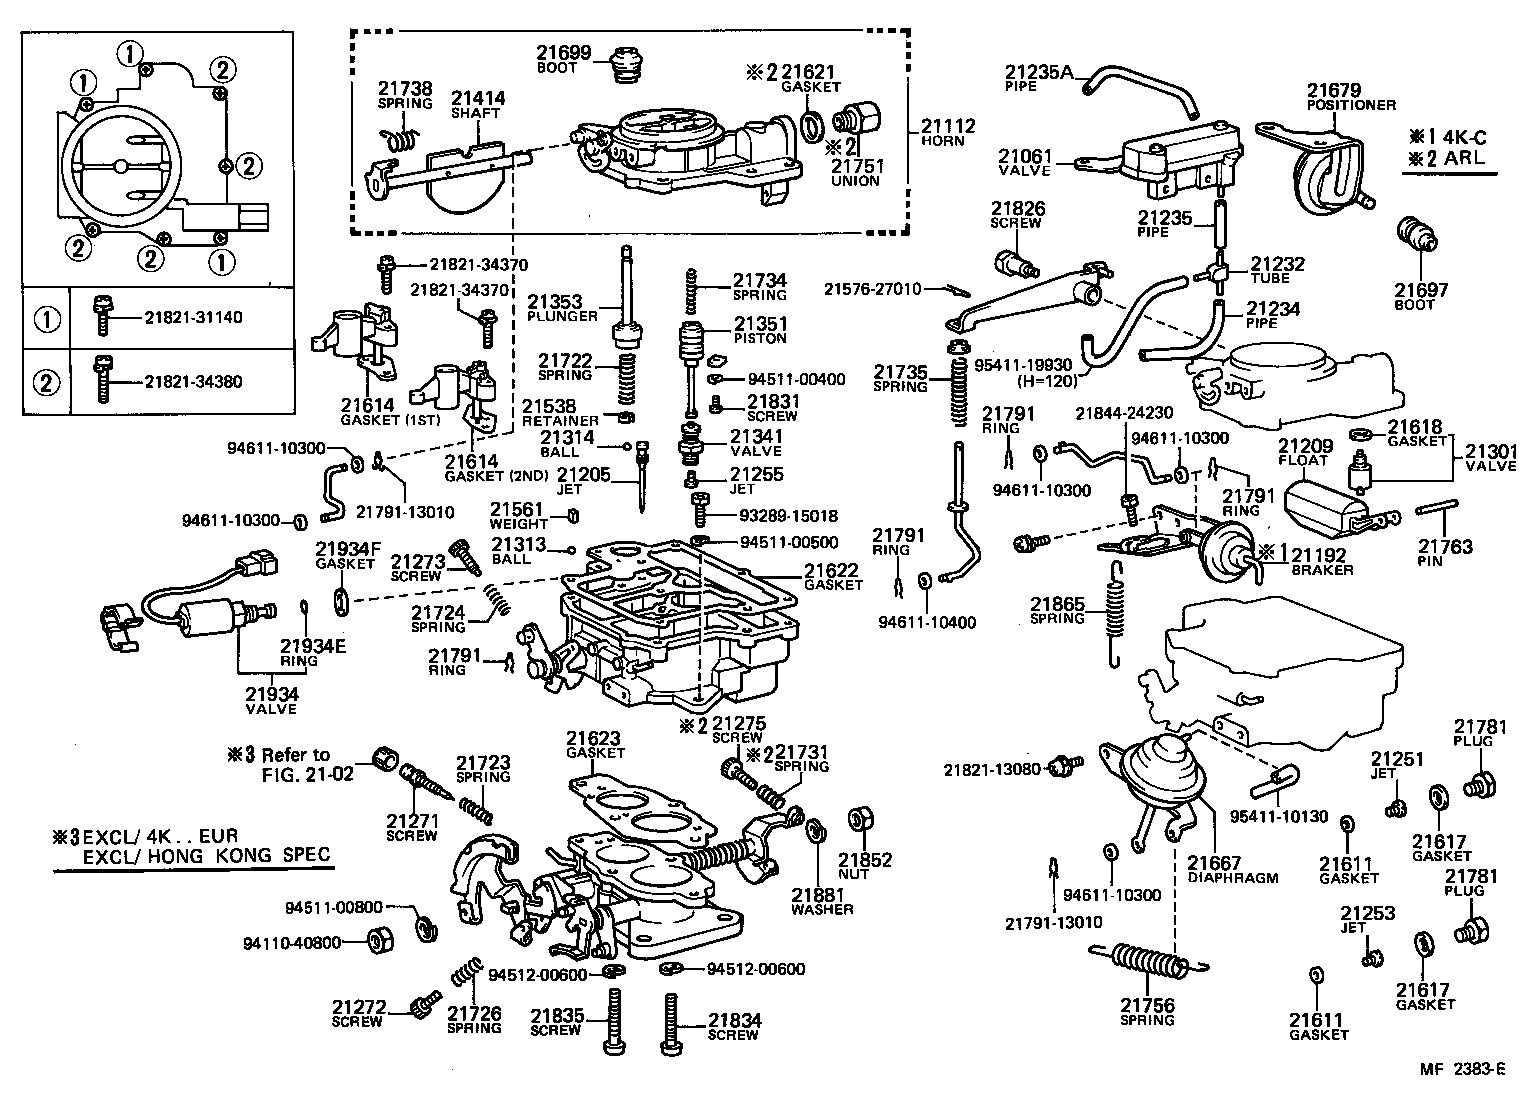 toyota liteacekm20rv-jrbe - tool-engine-fuel